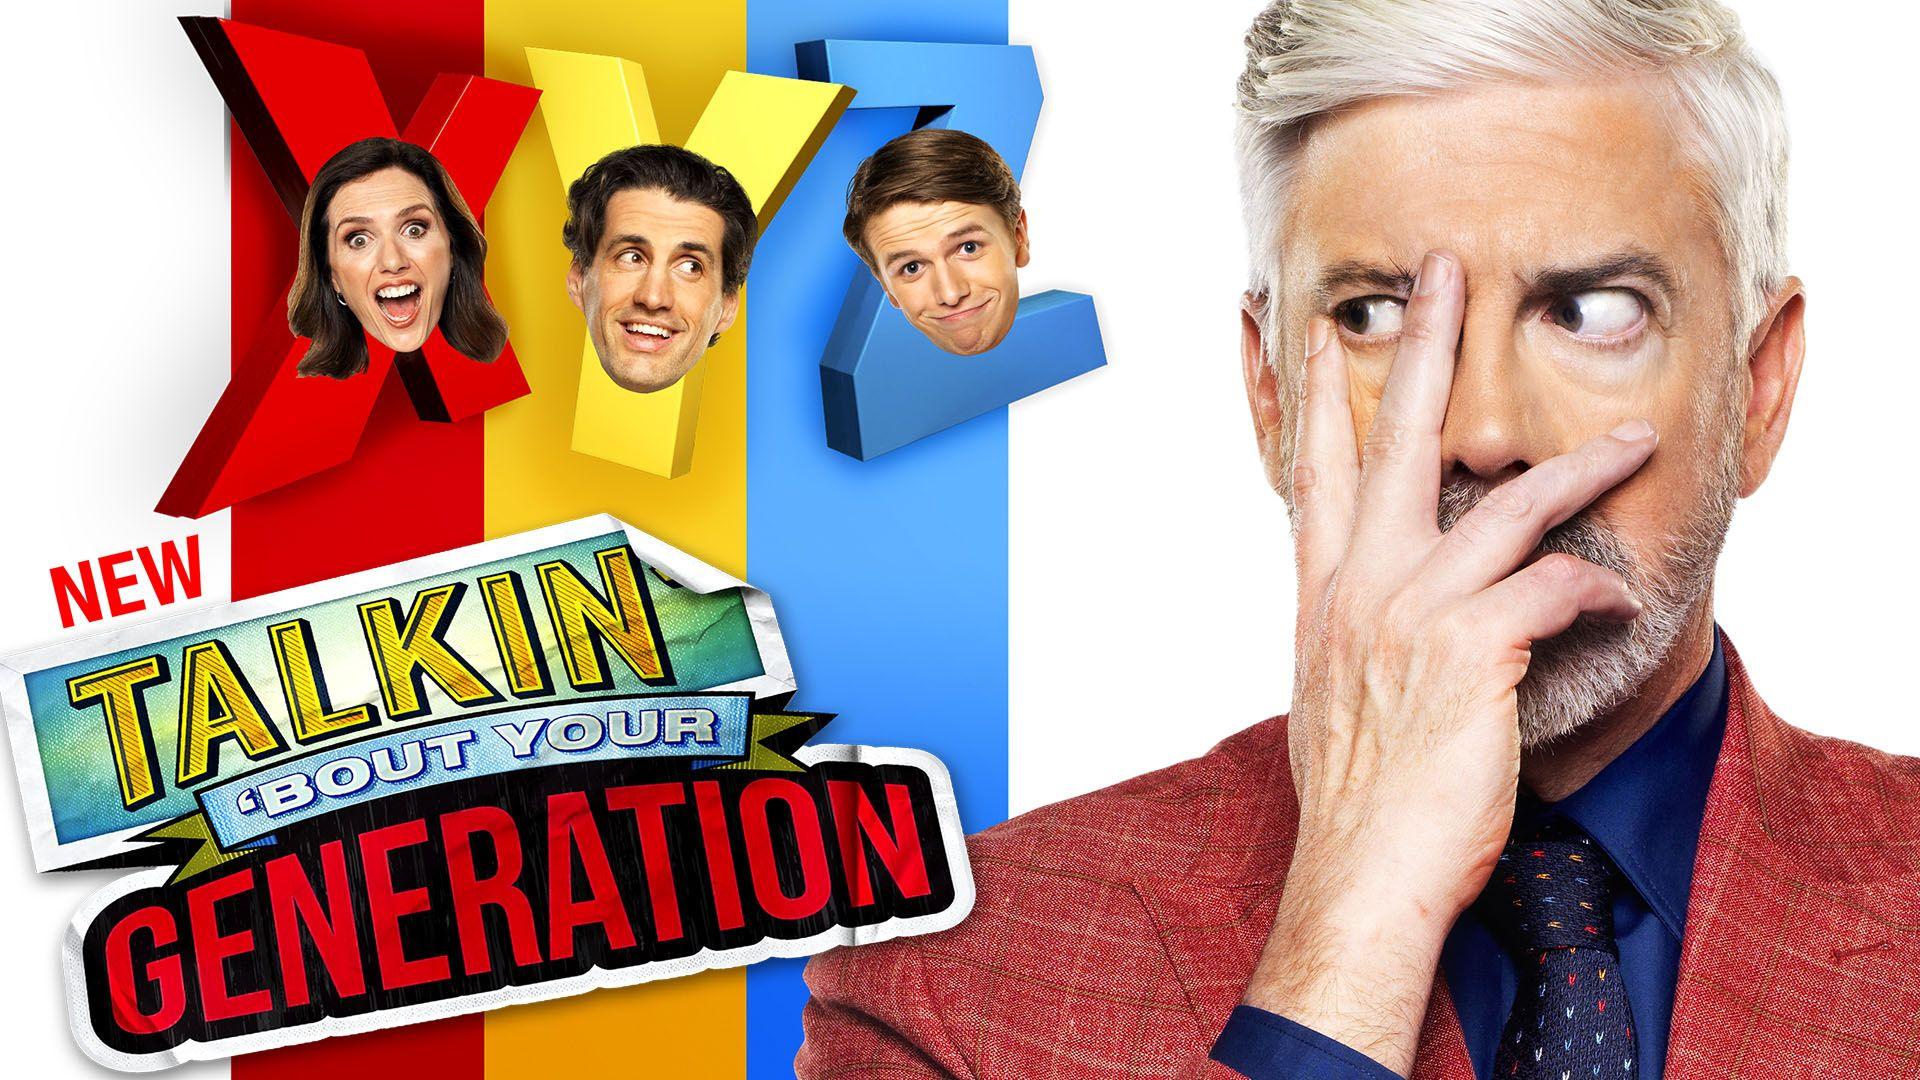 Talkin' 'Bout Your Generation  Source: Nine Entertainment Co